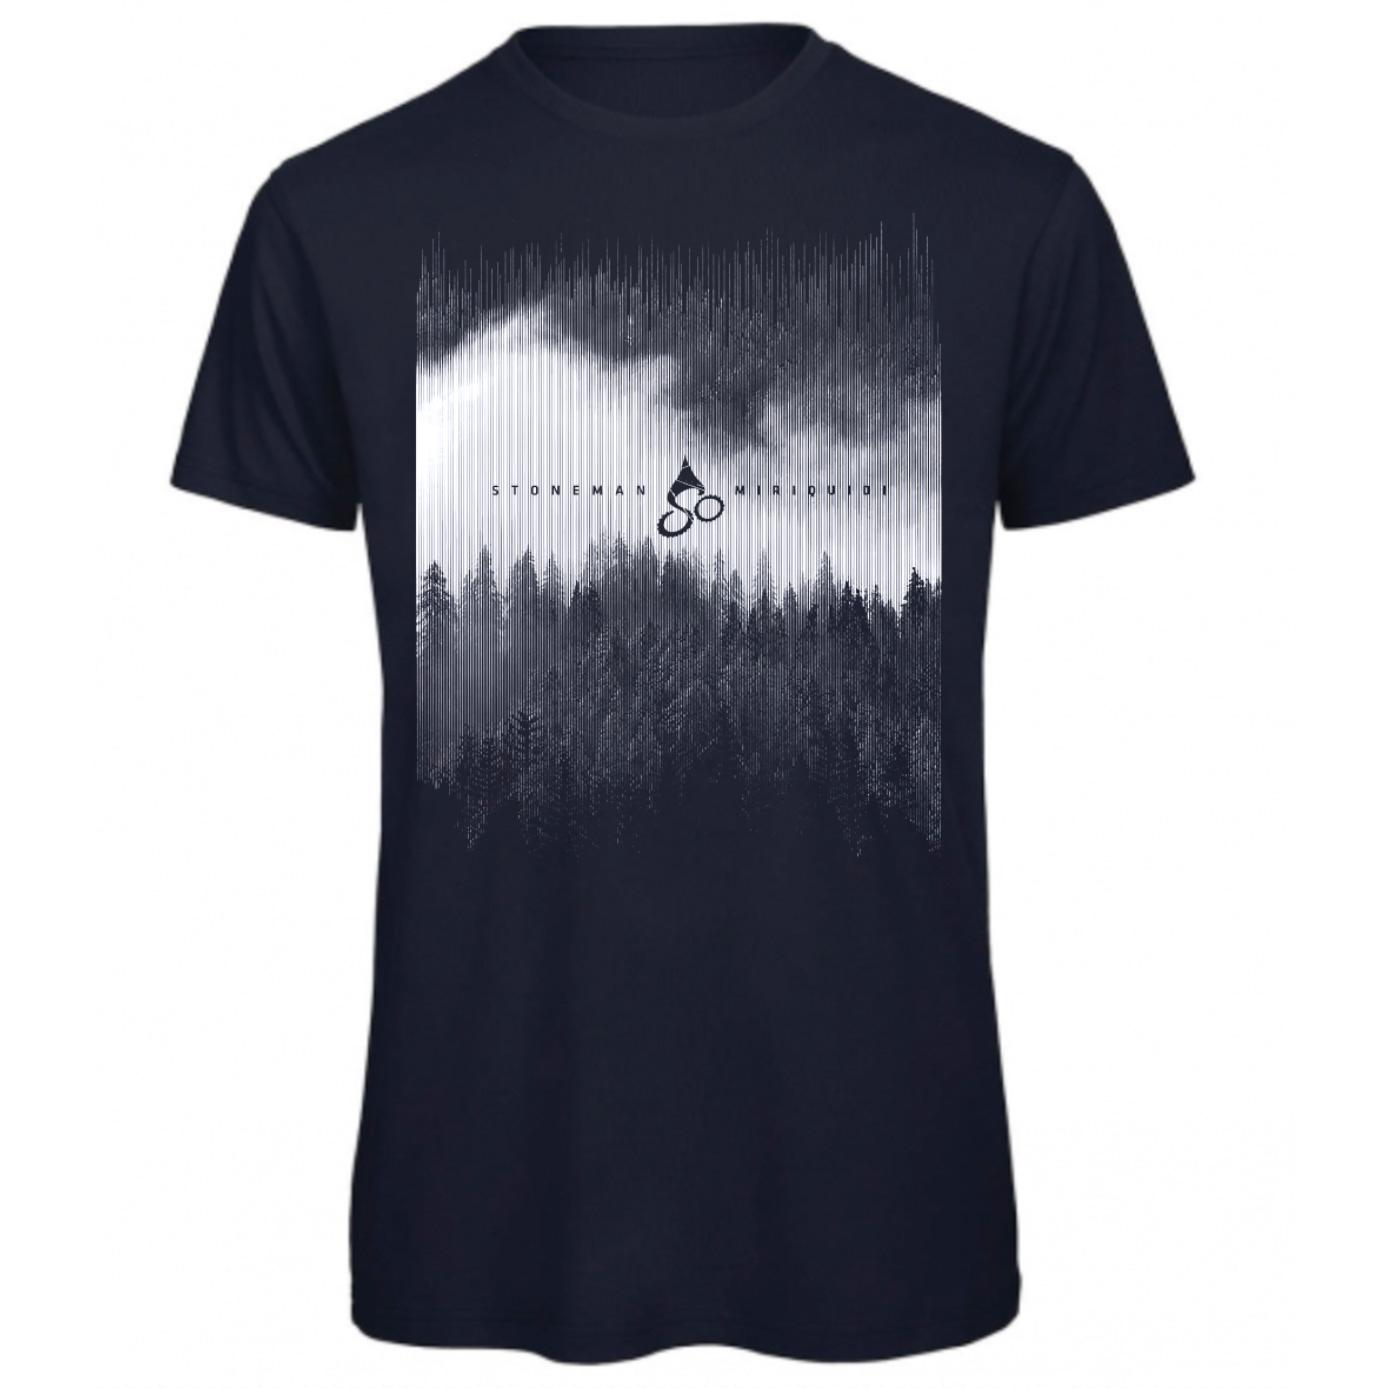 Stoneman Miriquidi »Dunkelwald« Männer T-Shirt - navy